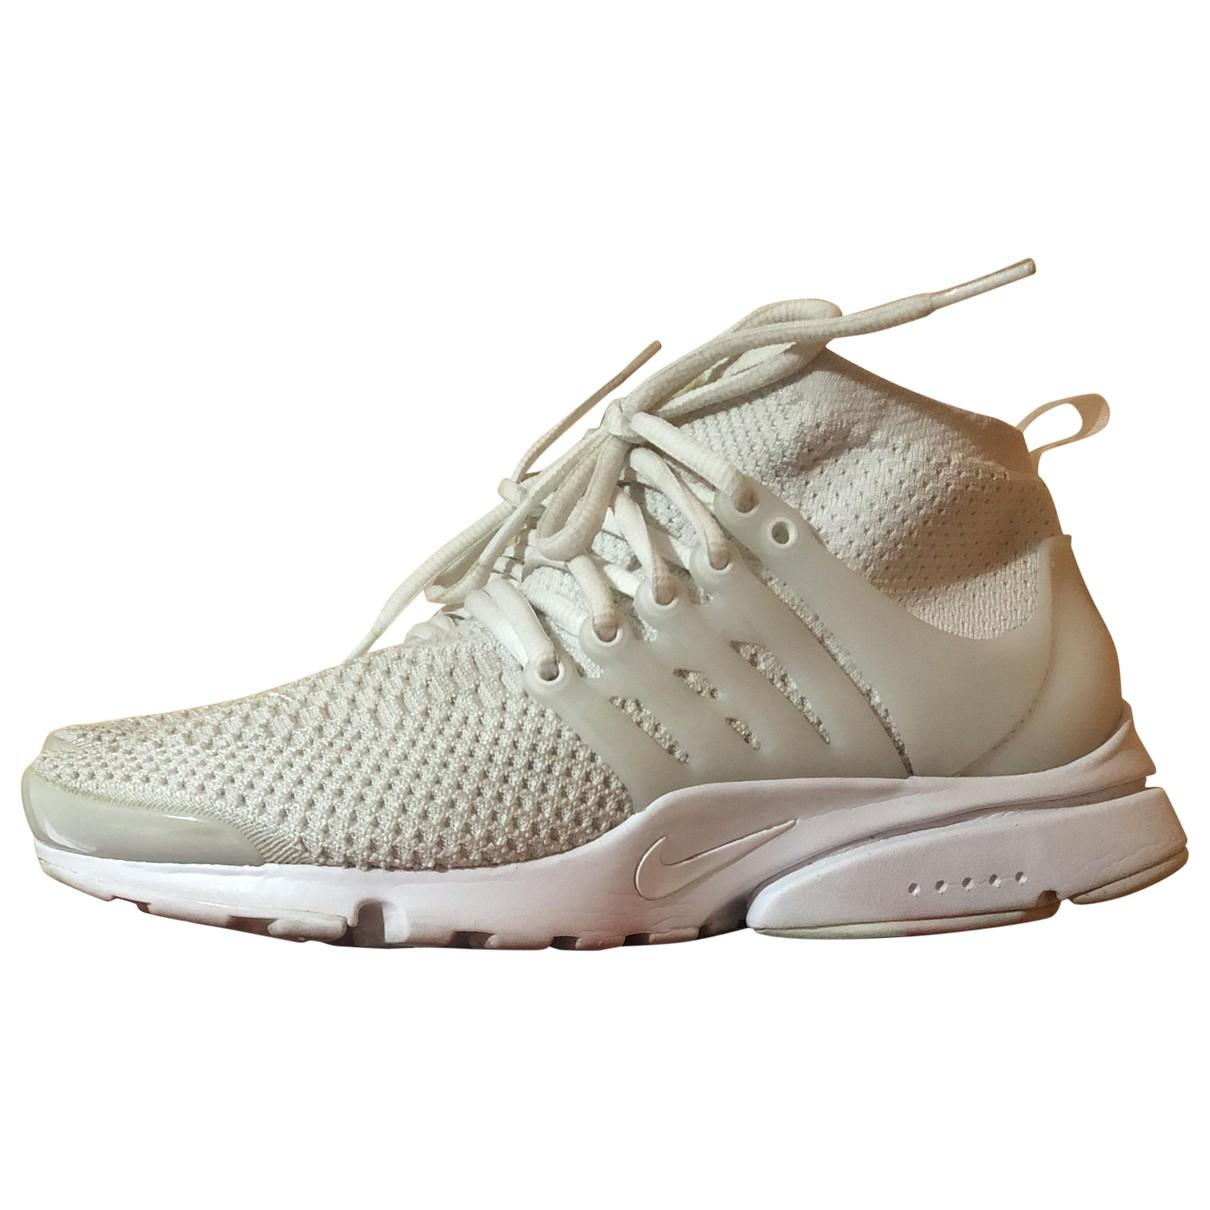 Nike Air Presto White Cloth Trainers for Men 8 US